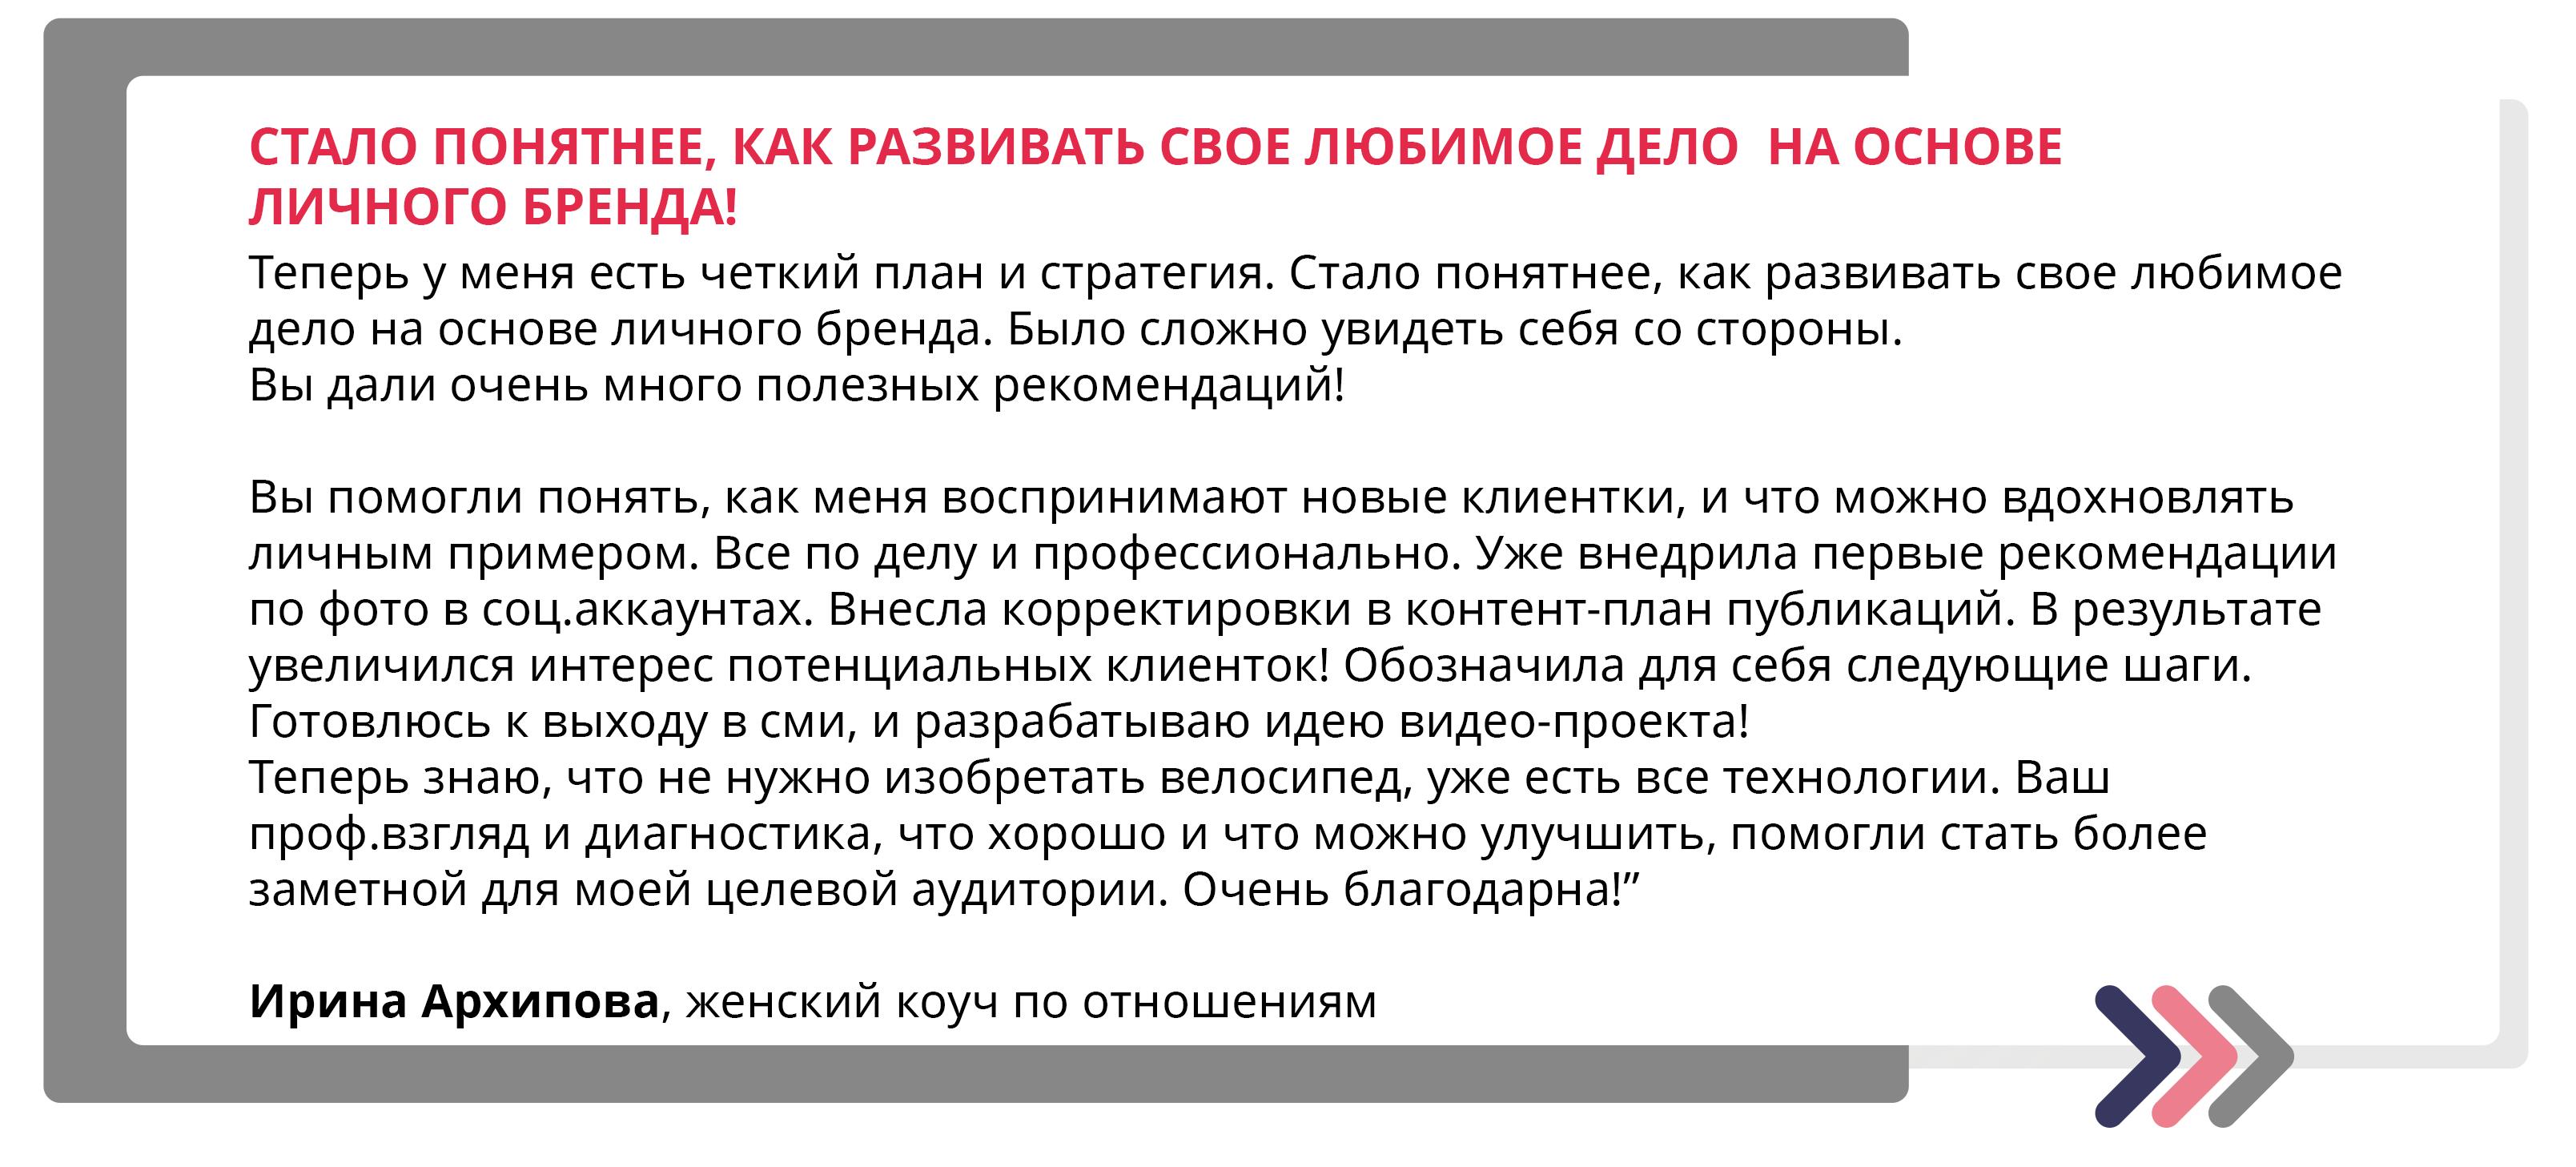 Отзыв Ирина Архипова